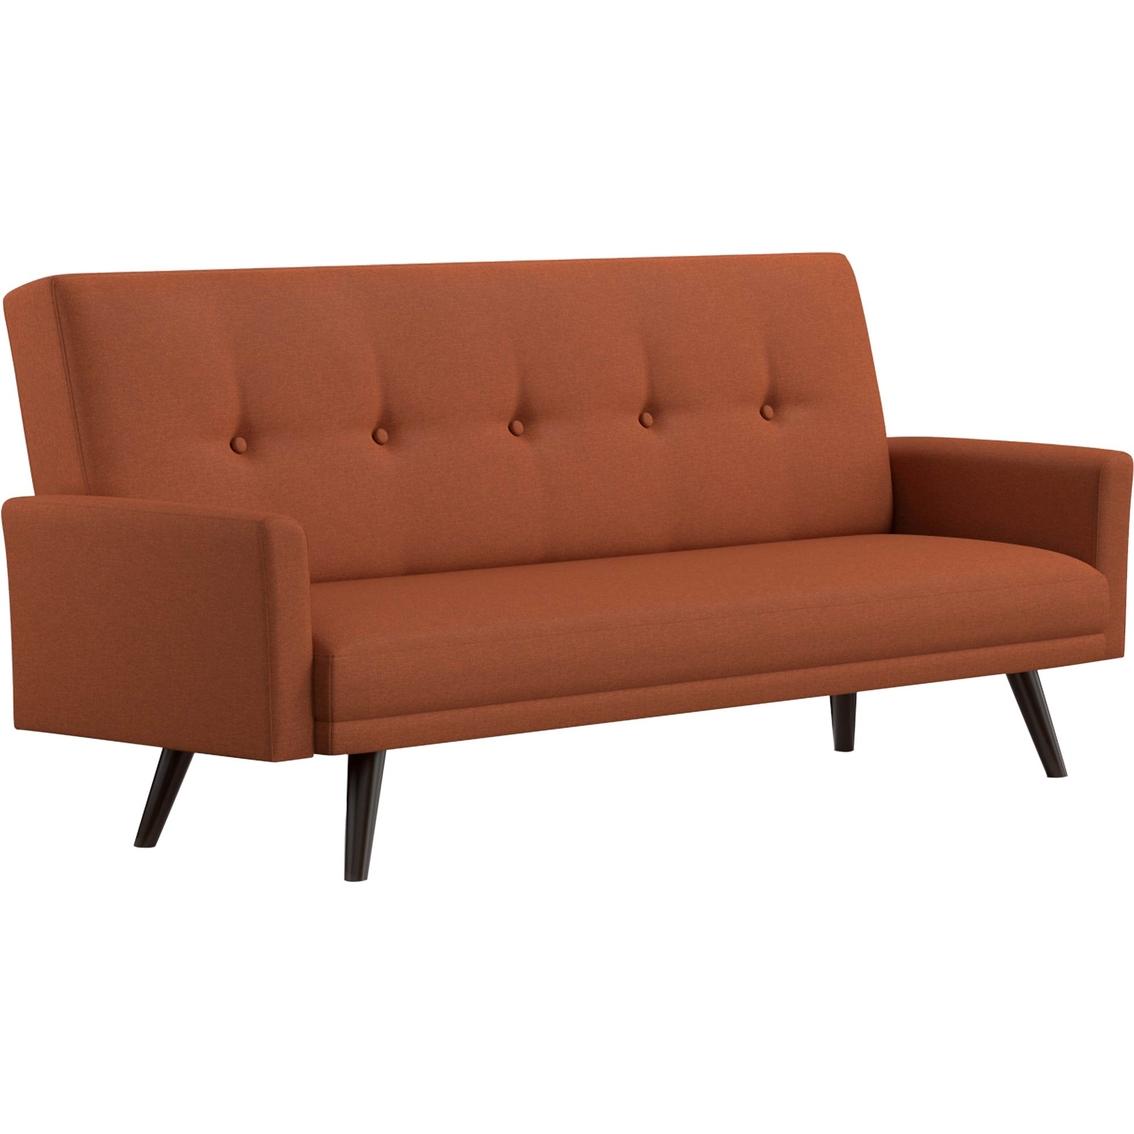 Handy Living Melbourne Futon Sofa Bed